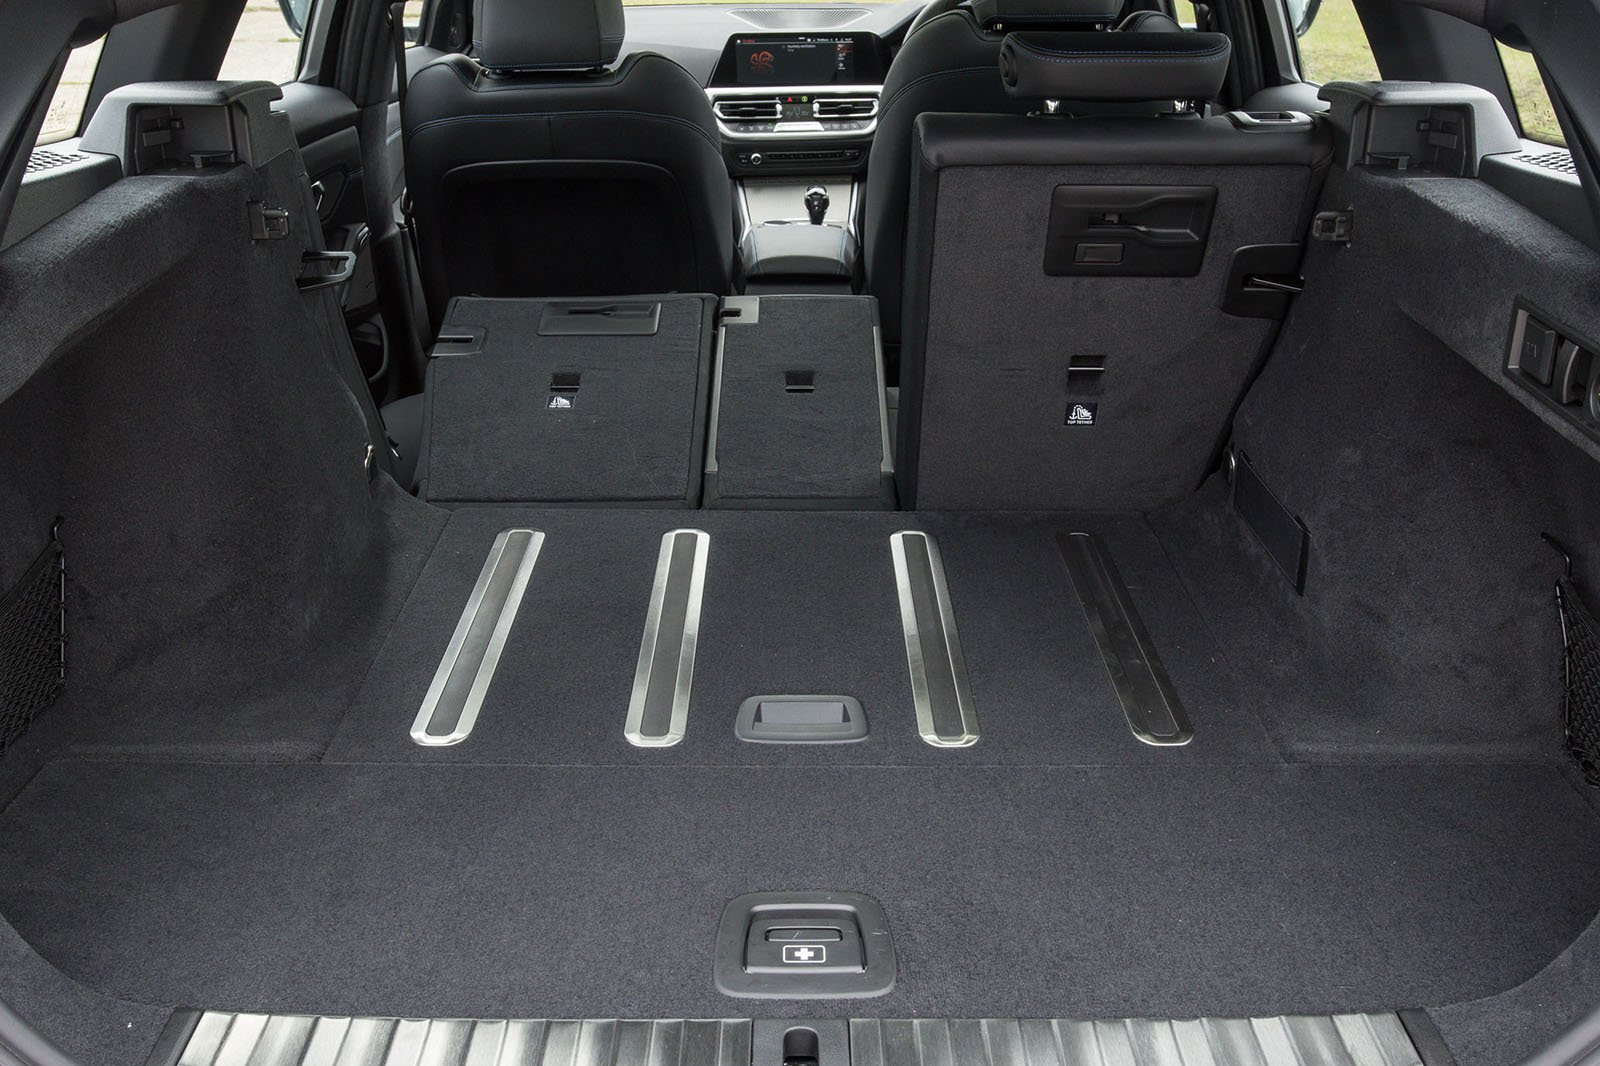 BMW 3 Series Touring 2021 RHD boot open